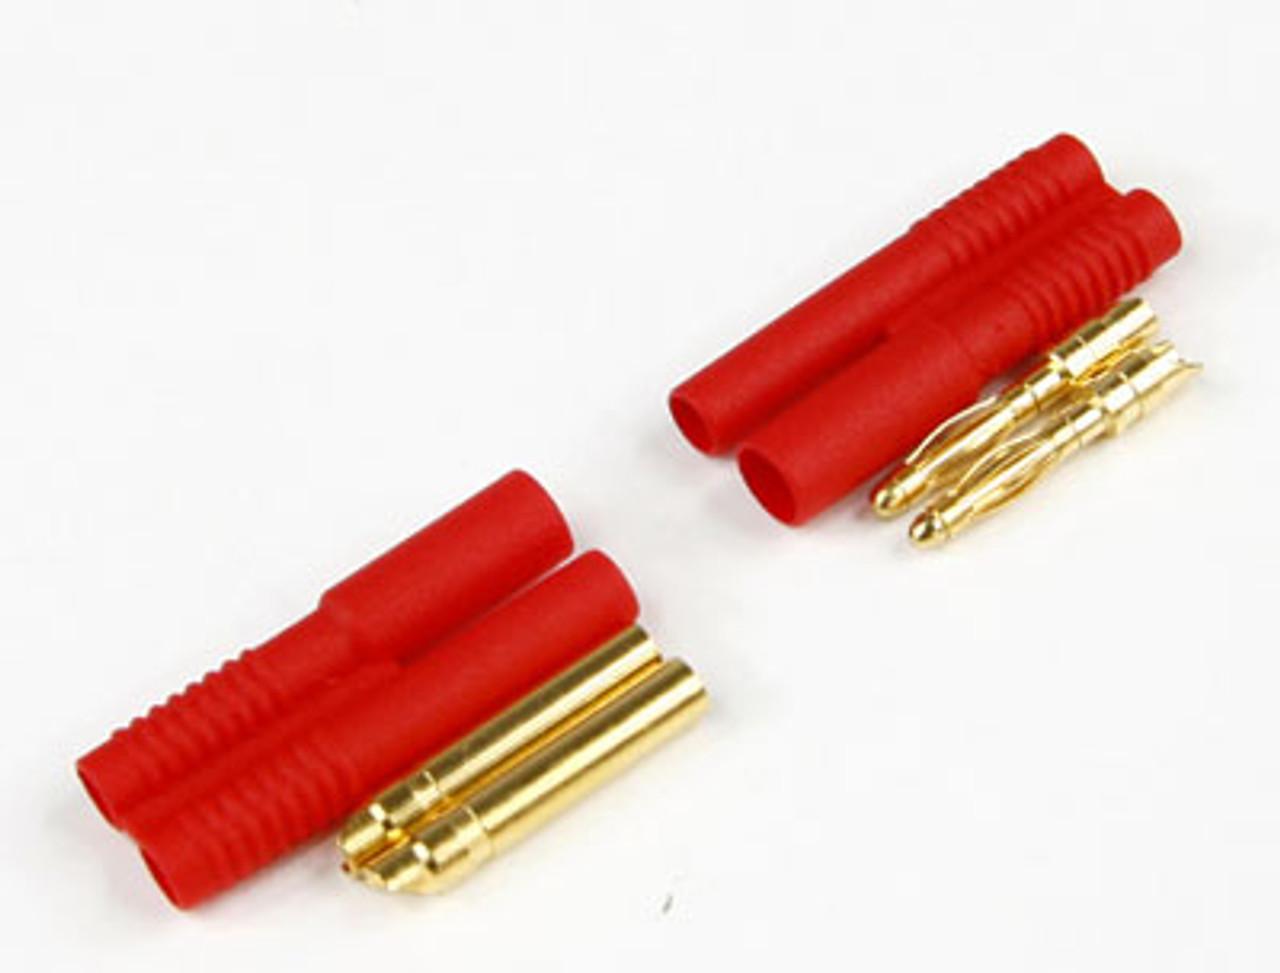 2mm Power Connectors